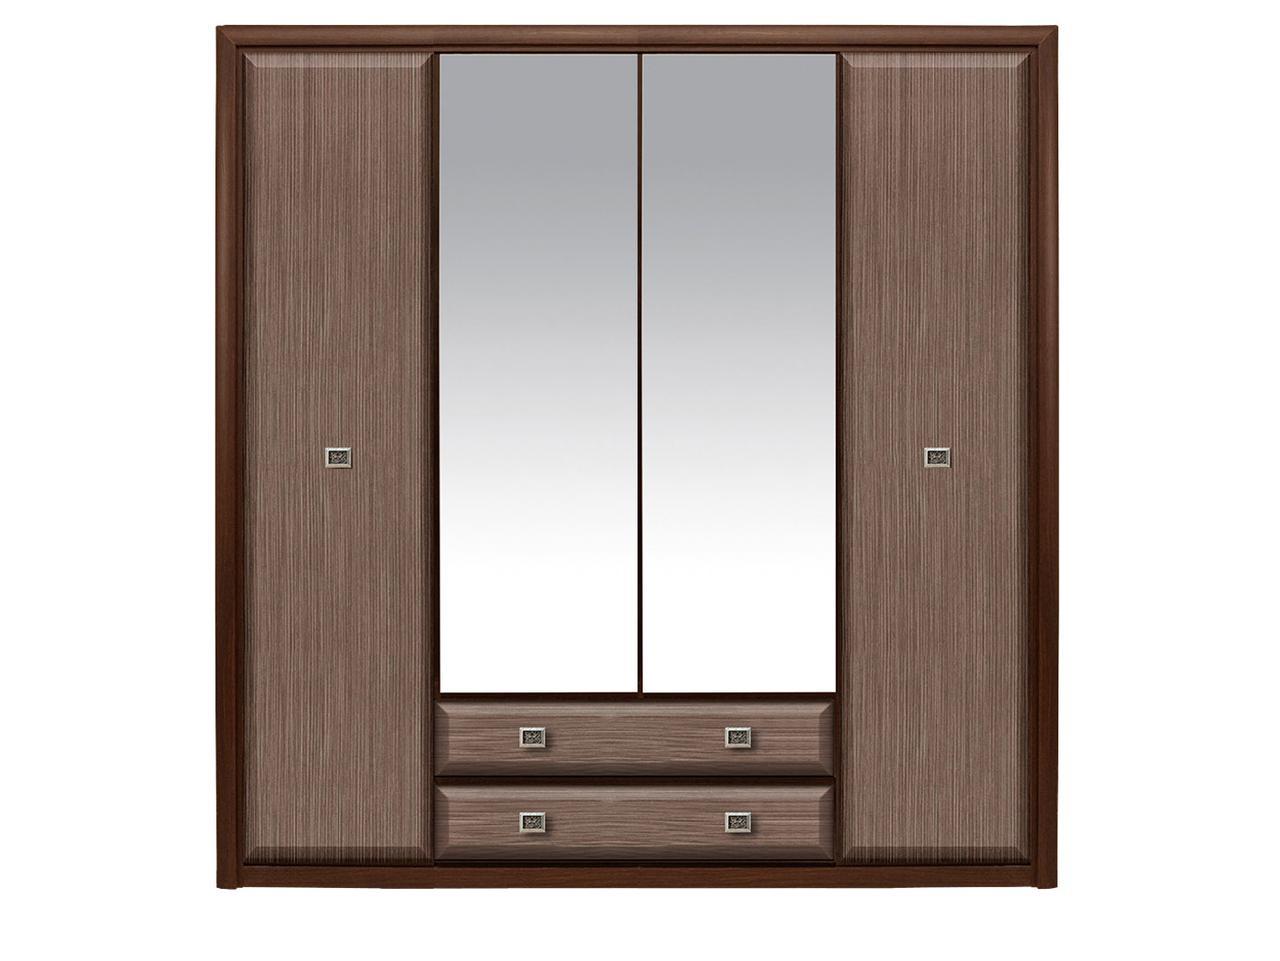 Шкаф для одежды 4Д , коллекции Коен МДФ, Штрокс Темный, БРВ Брест (Беларусь)